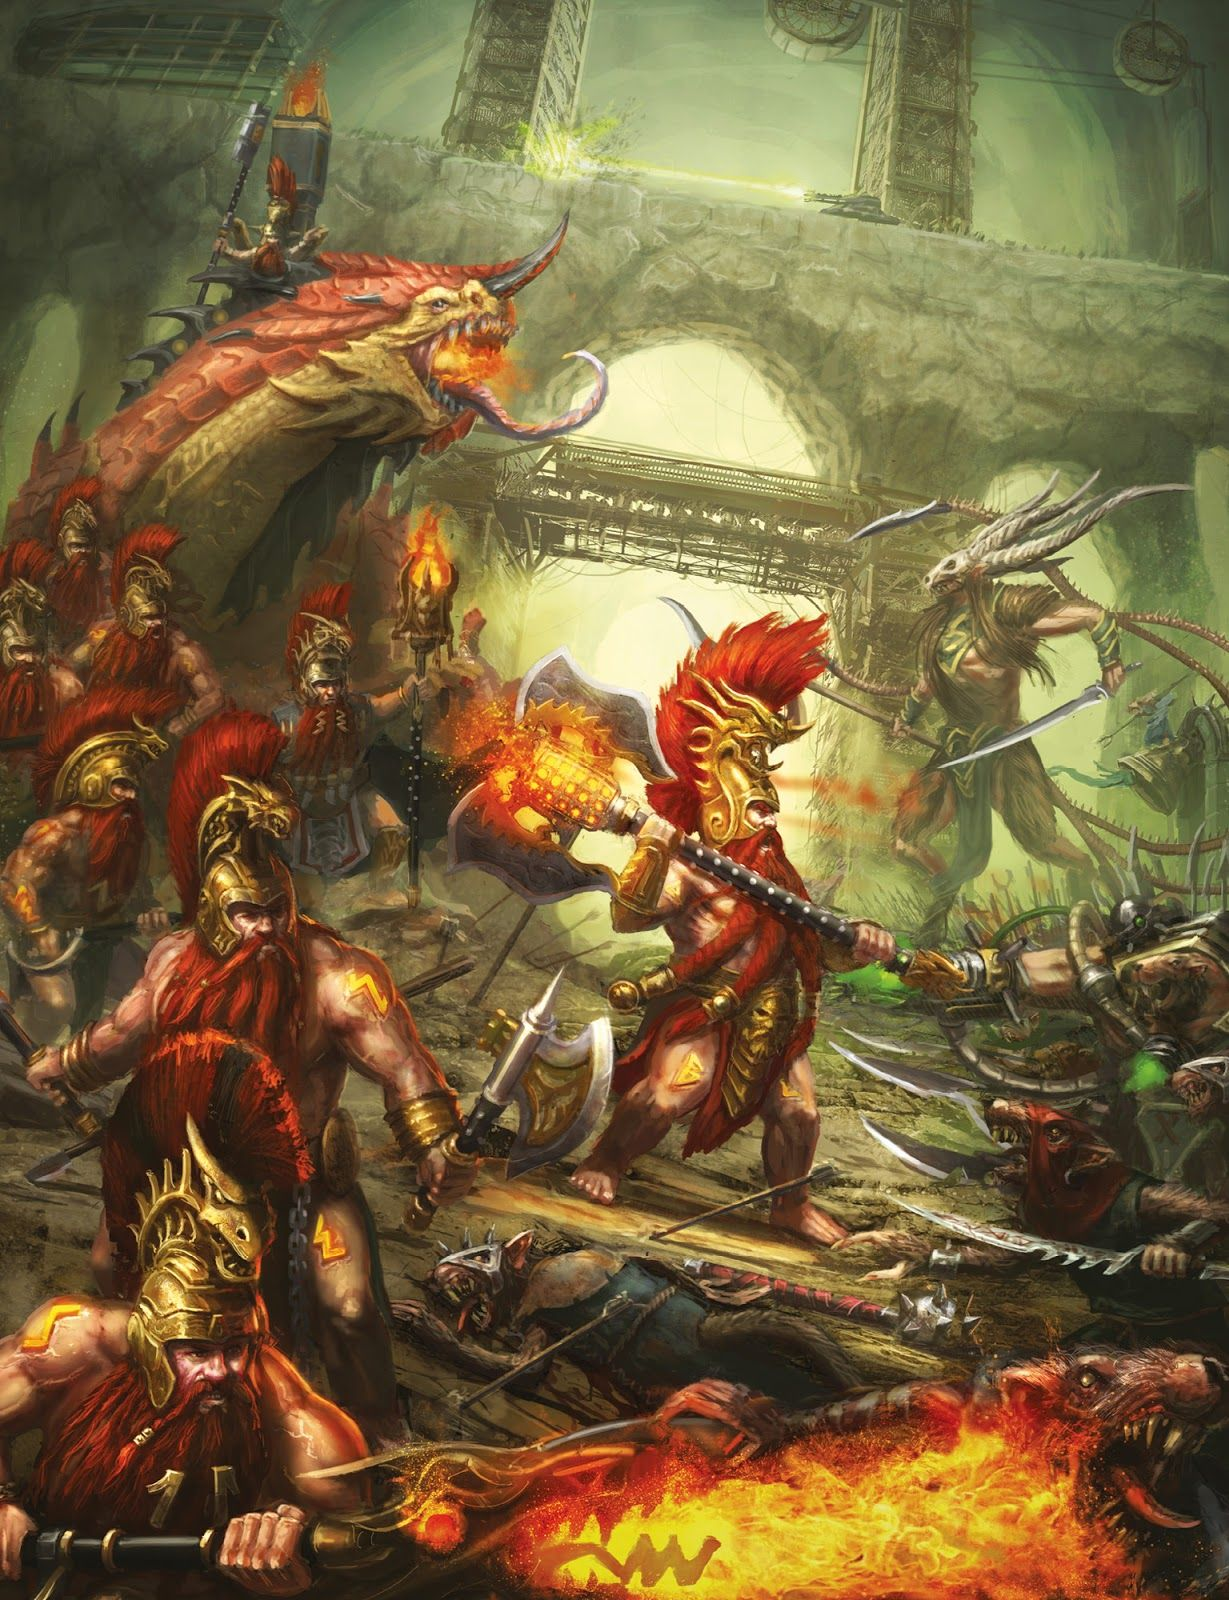 http://wellofeternitypl.blogspot.com/ Age of Sigmar Artwork | Fyreslayers vs Skaven #artwork #art #aos #warhammer #ageofsigmar #sigmar #arts #artworks #gw #gamesworkshop #wellofeternity #wargaming